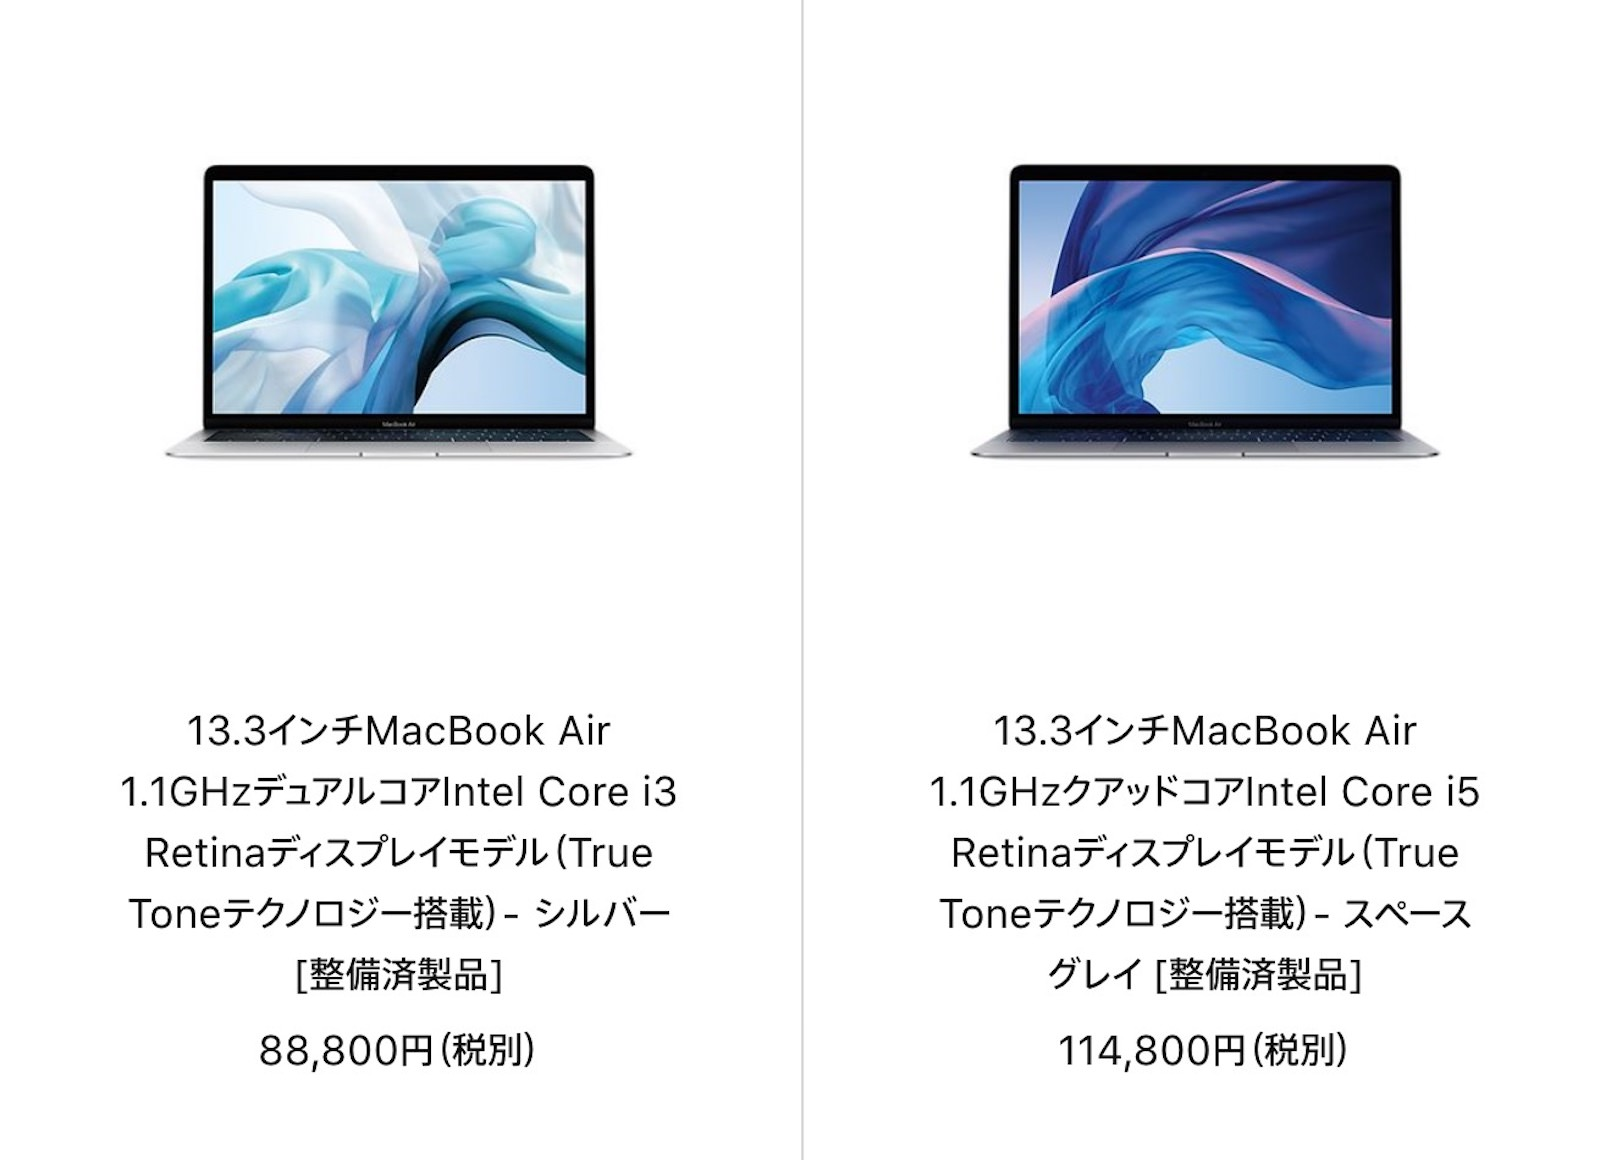 Macbook air refurbished quad core and dual core